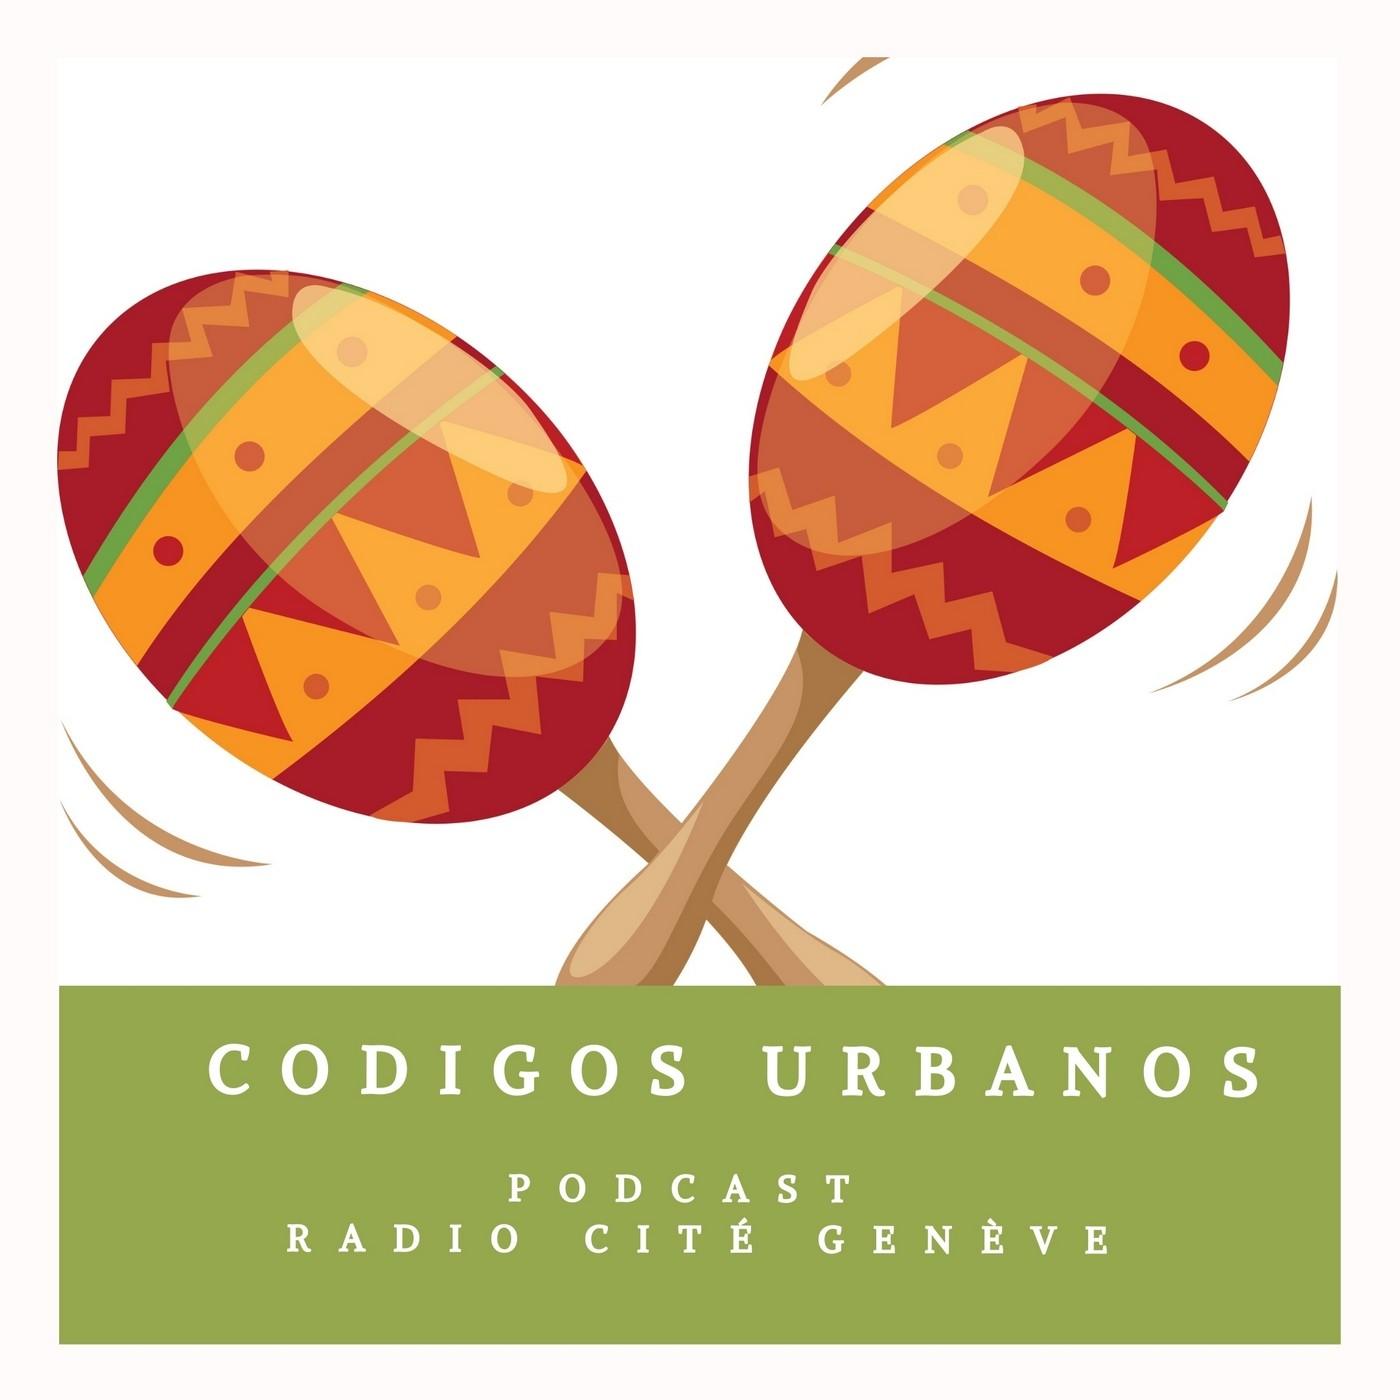 Codigos Urbanos - 23/03/21